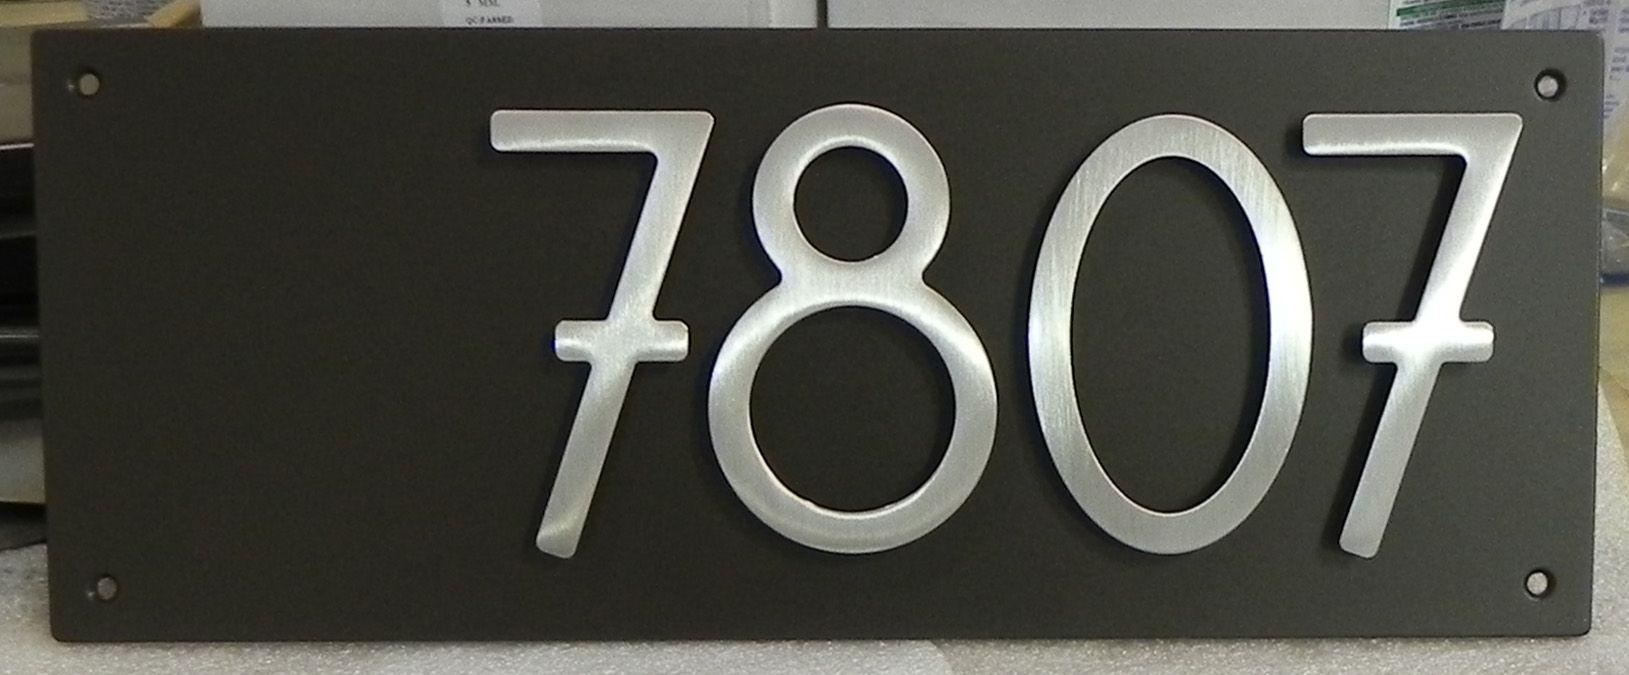 4digit modern address plaque with dark bronze plaque and brushed